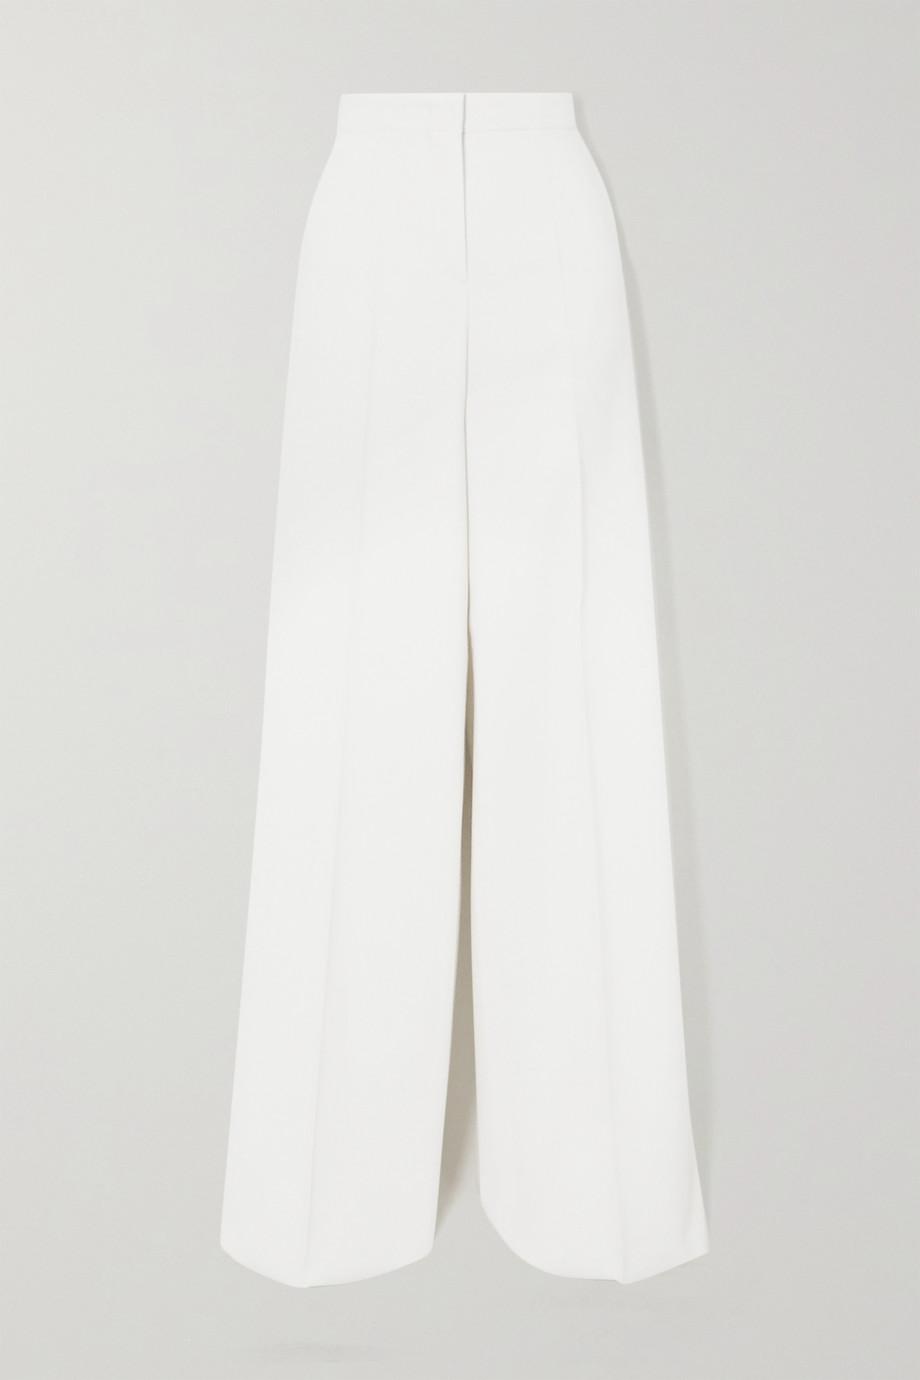 Max Mara Stretch-wool wide-leg pants